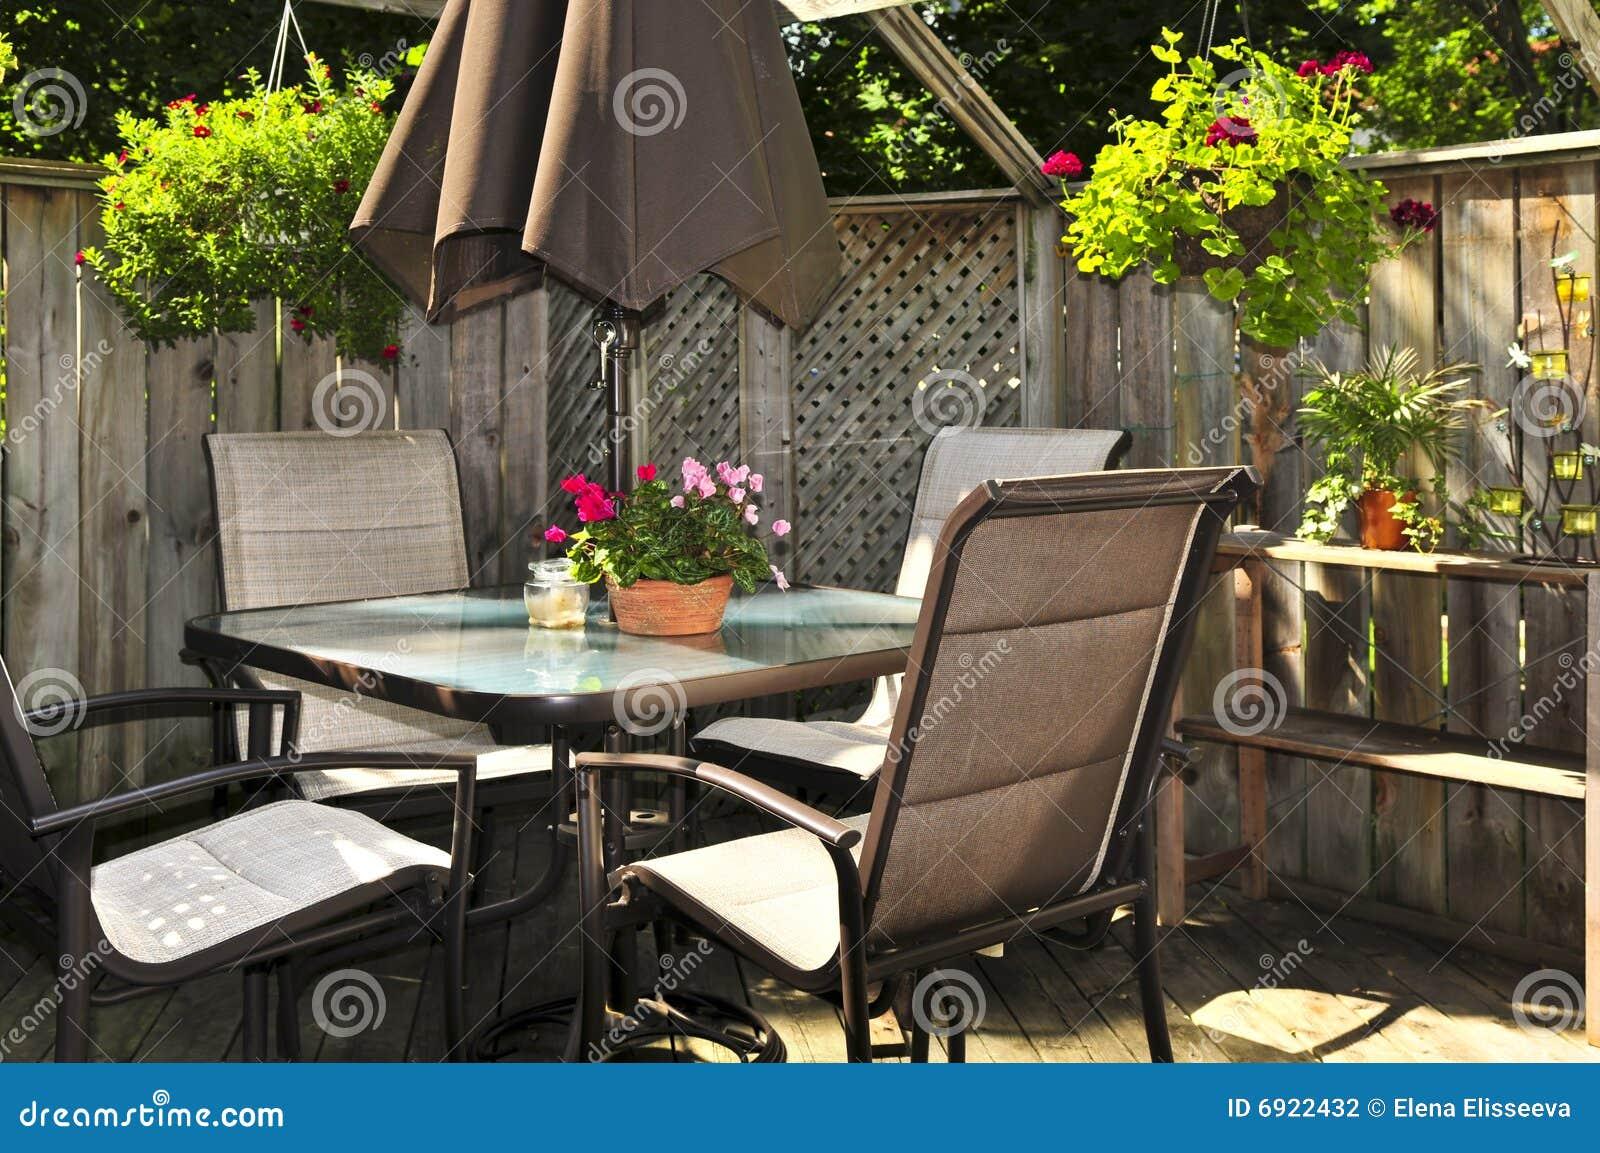 balcony patio furniture balcony furniture design deck and patio furniture balcony patio furniture balcony furniture design